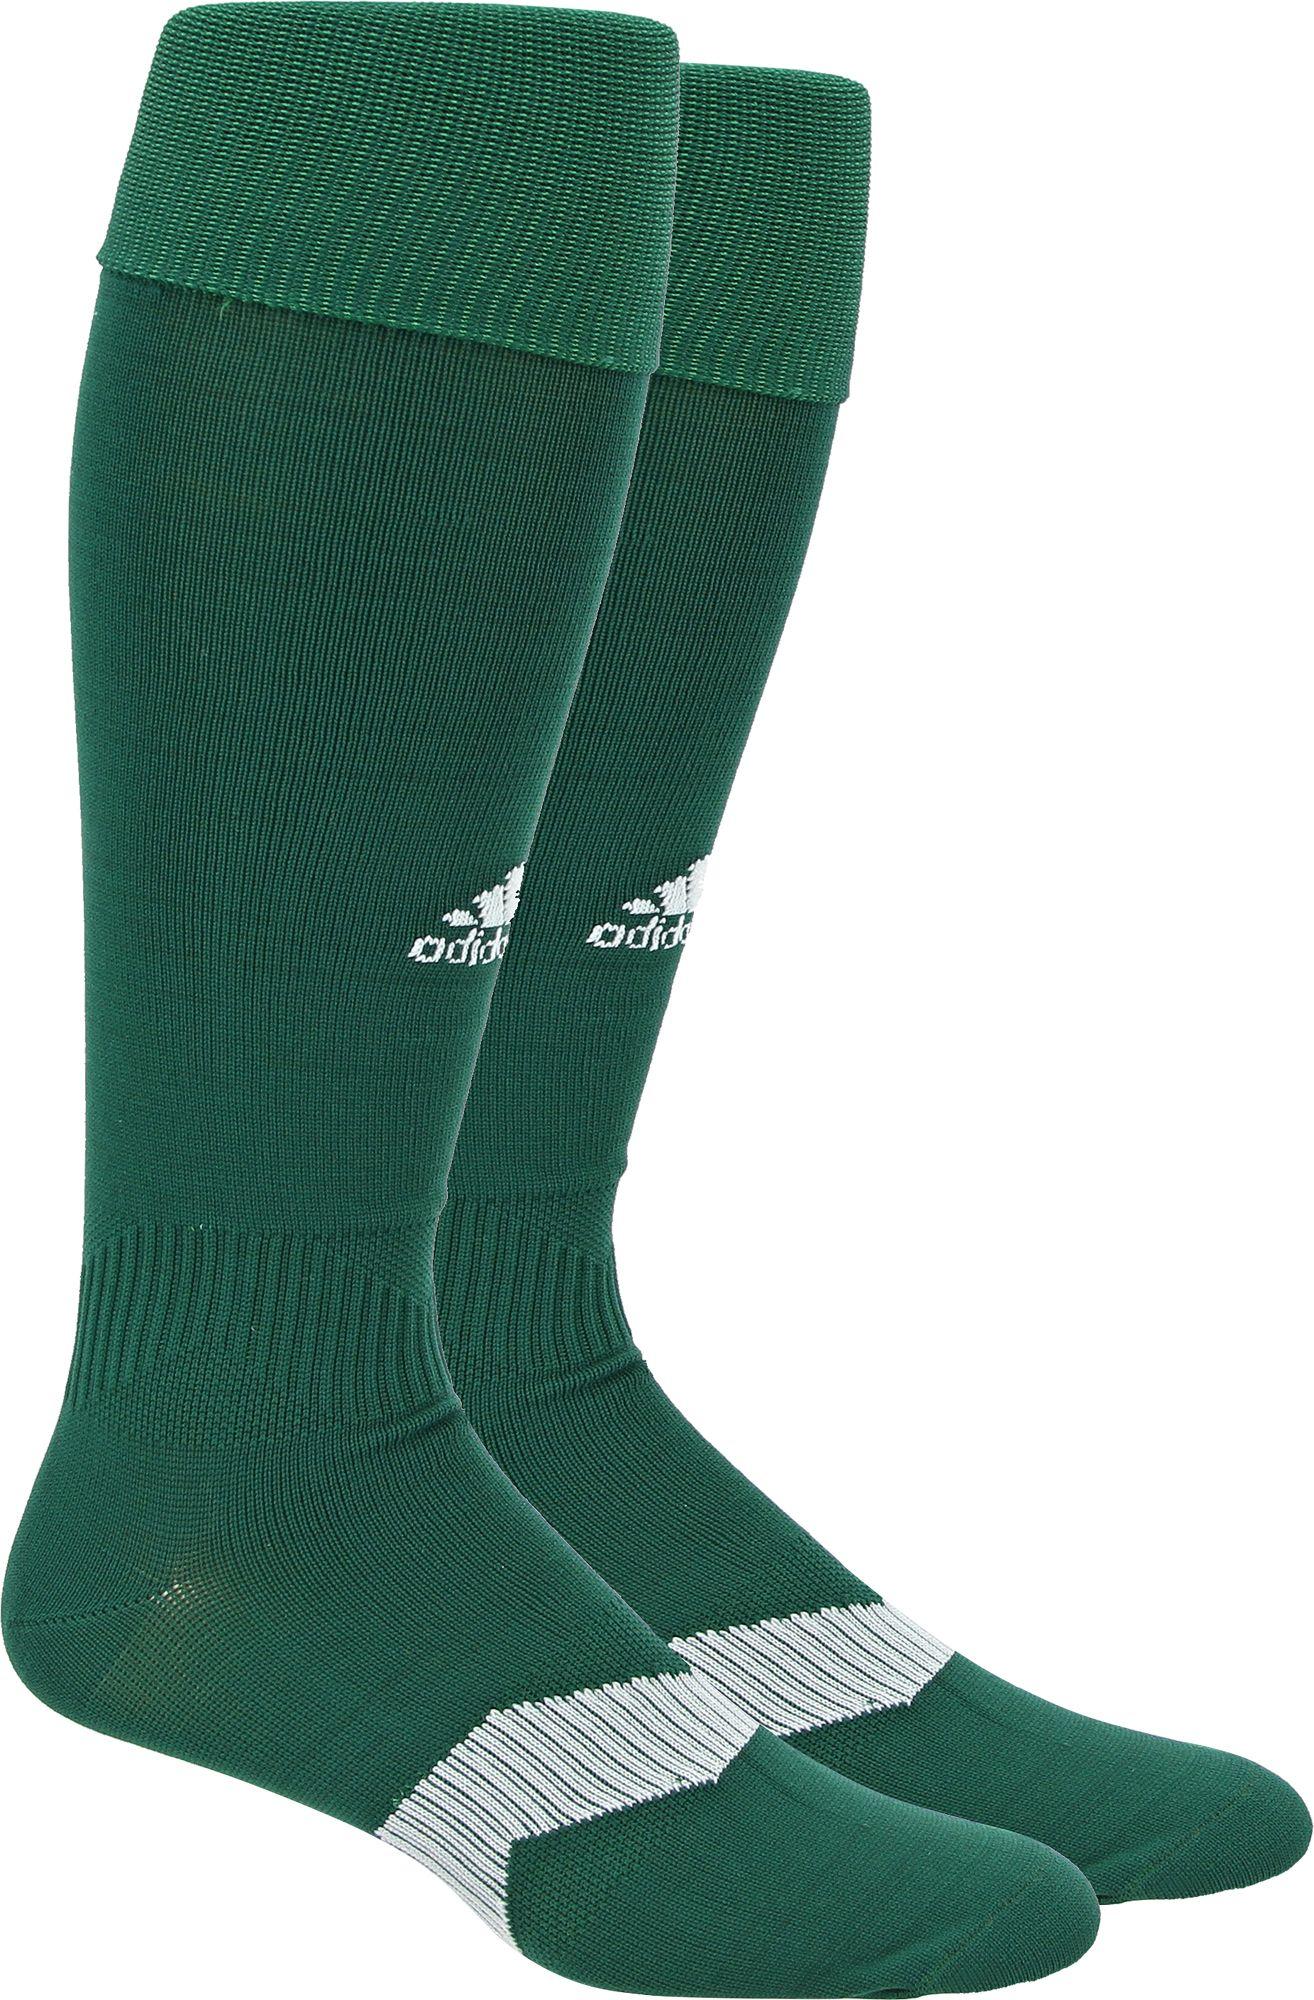 adidas socks noimagefound ??? QKGHKIM